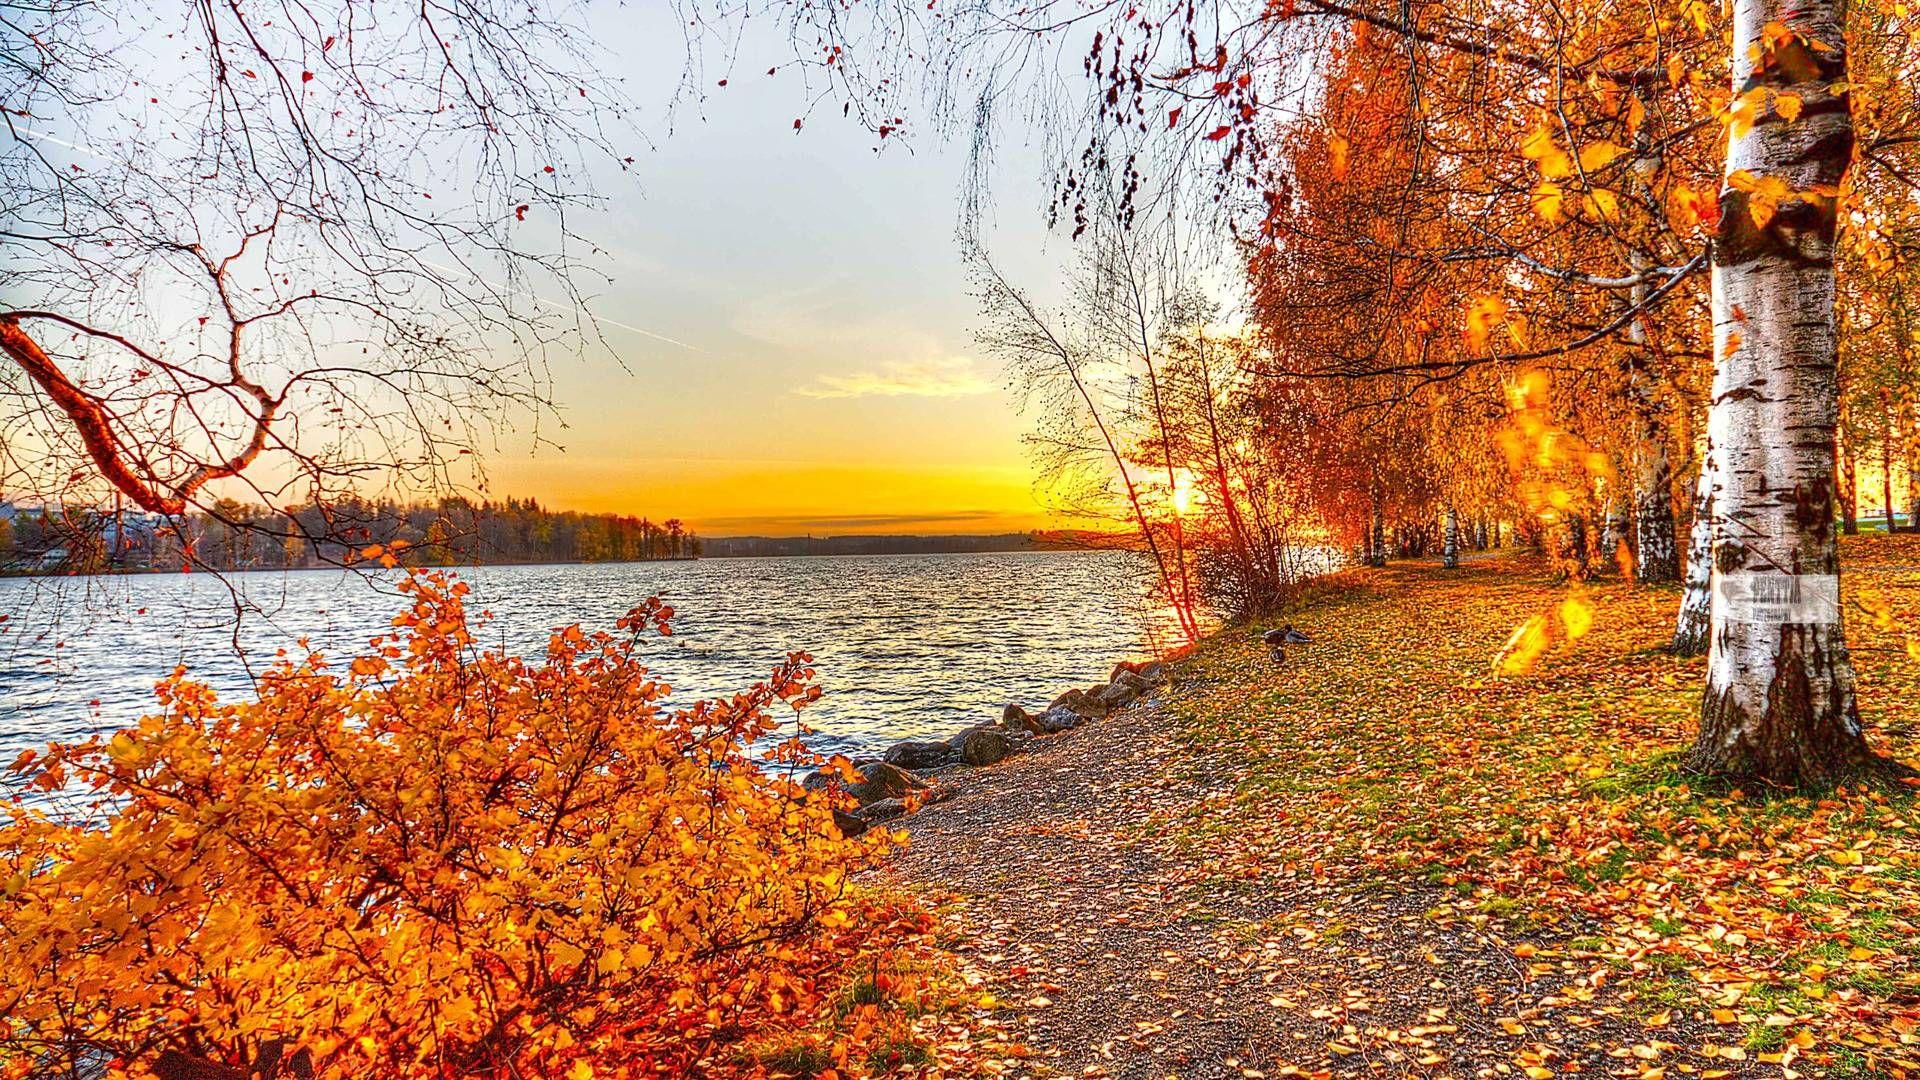 Fall Wallpaper Backgrounds Hd Autumn Landscape Wallpaper 819446 Automn Landscapes